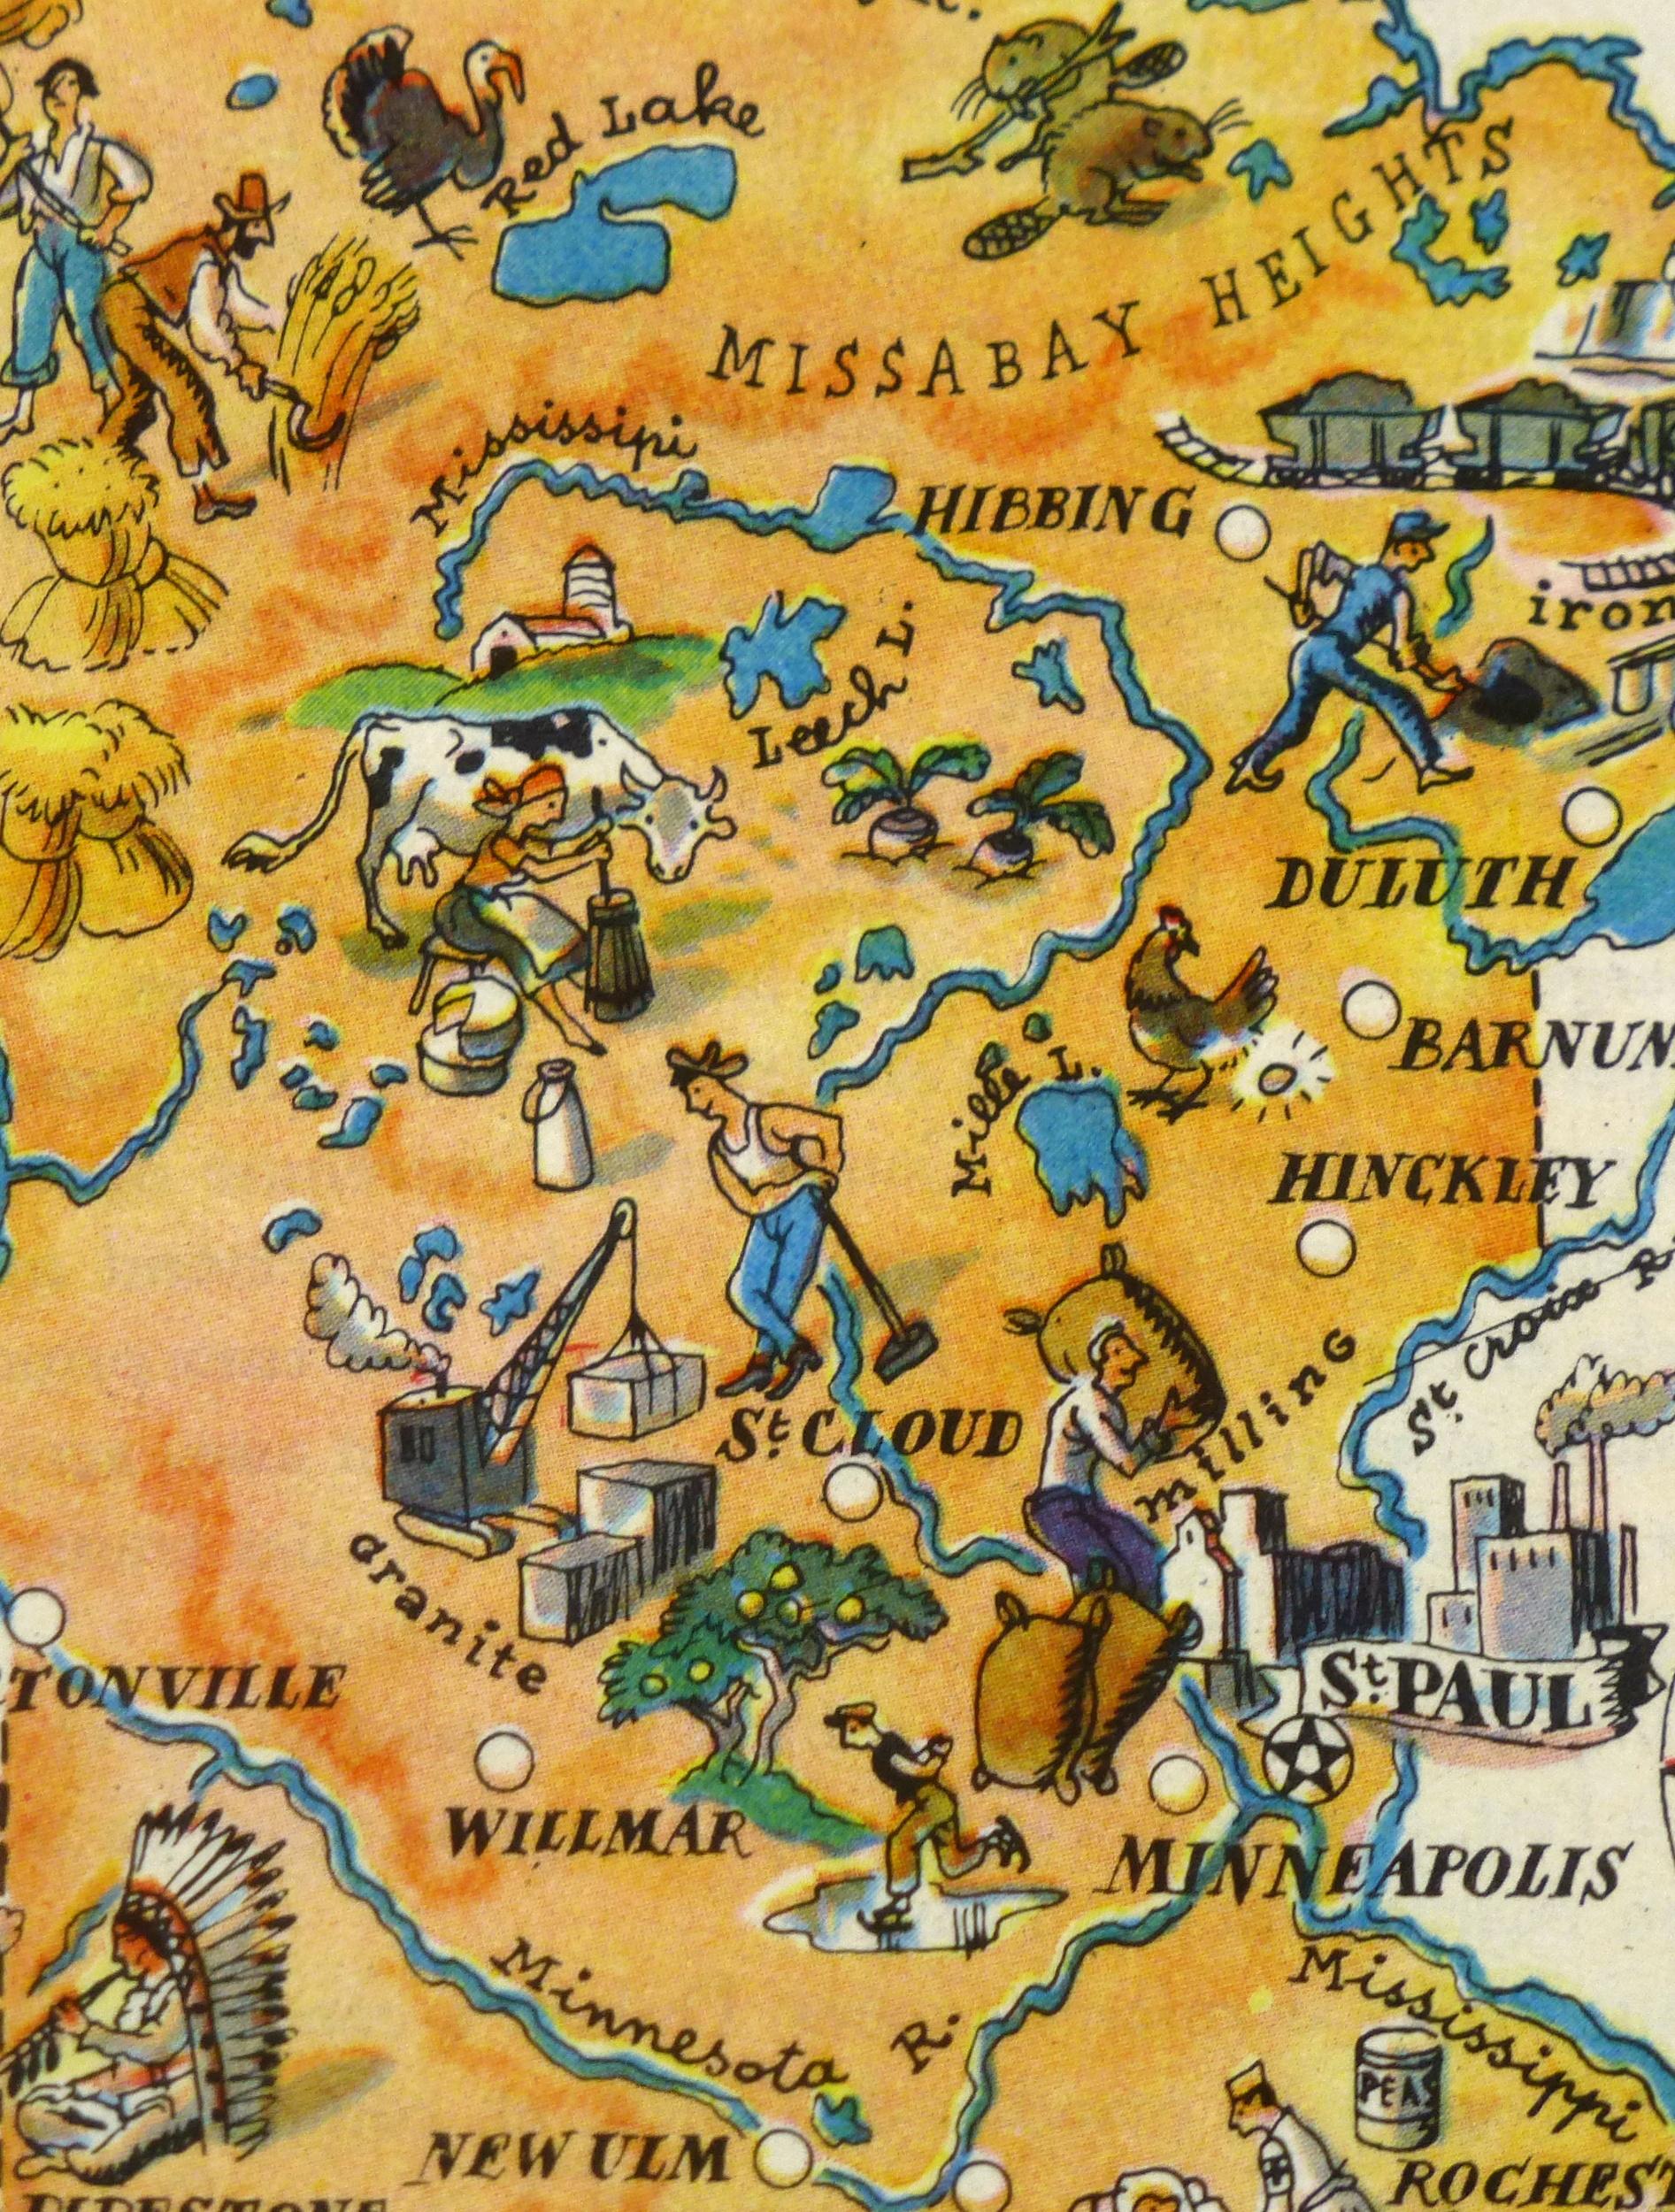 Minnesota Pictorial Map, 1946-detail-6230K